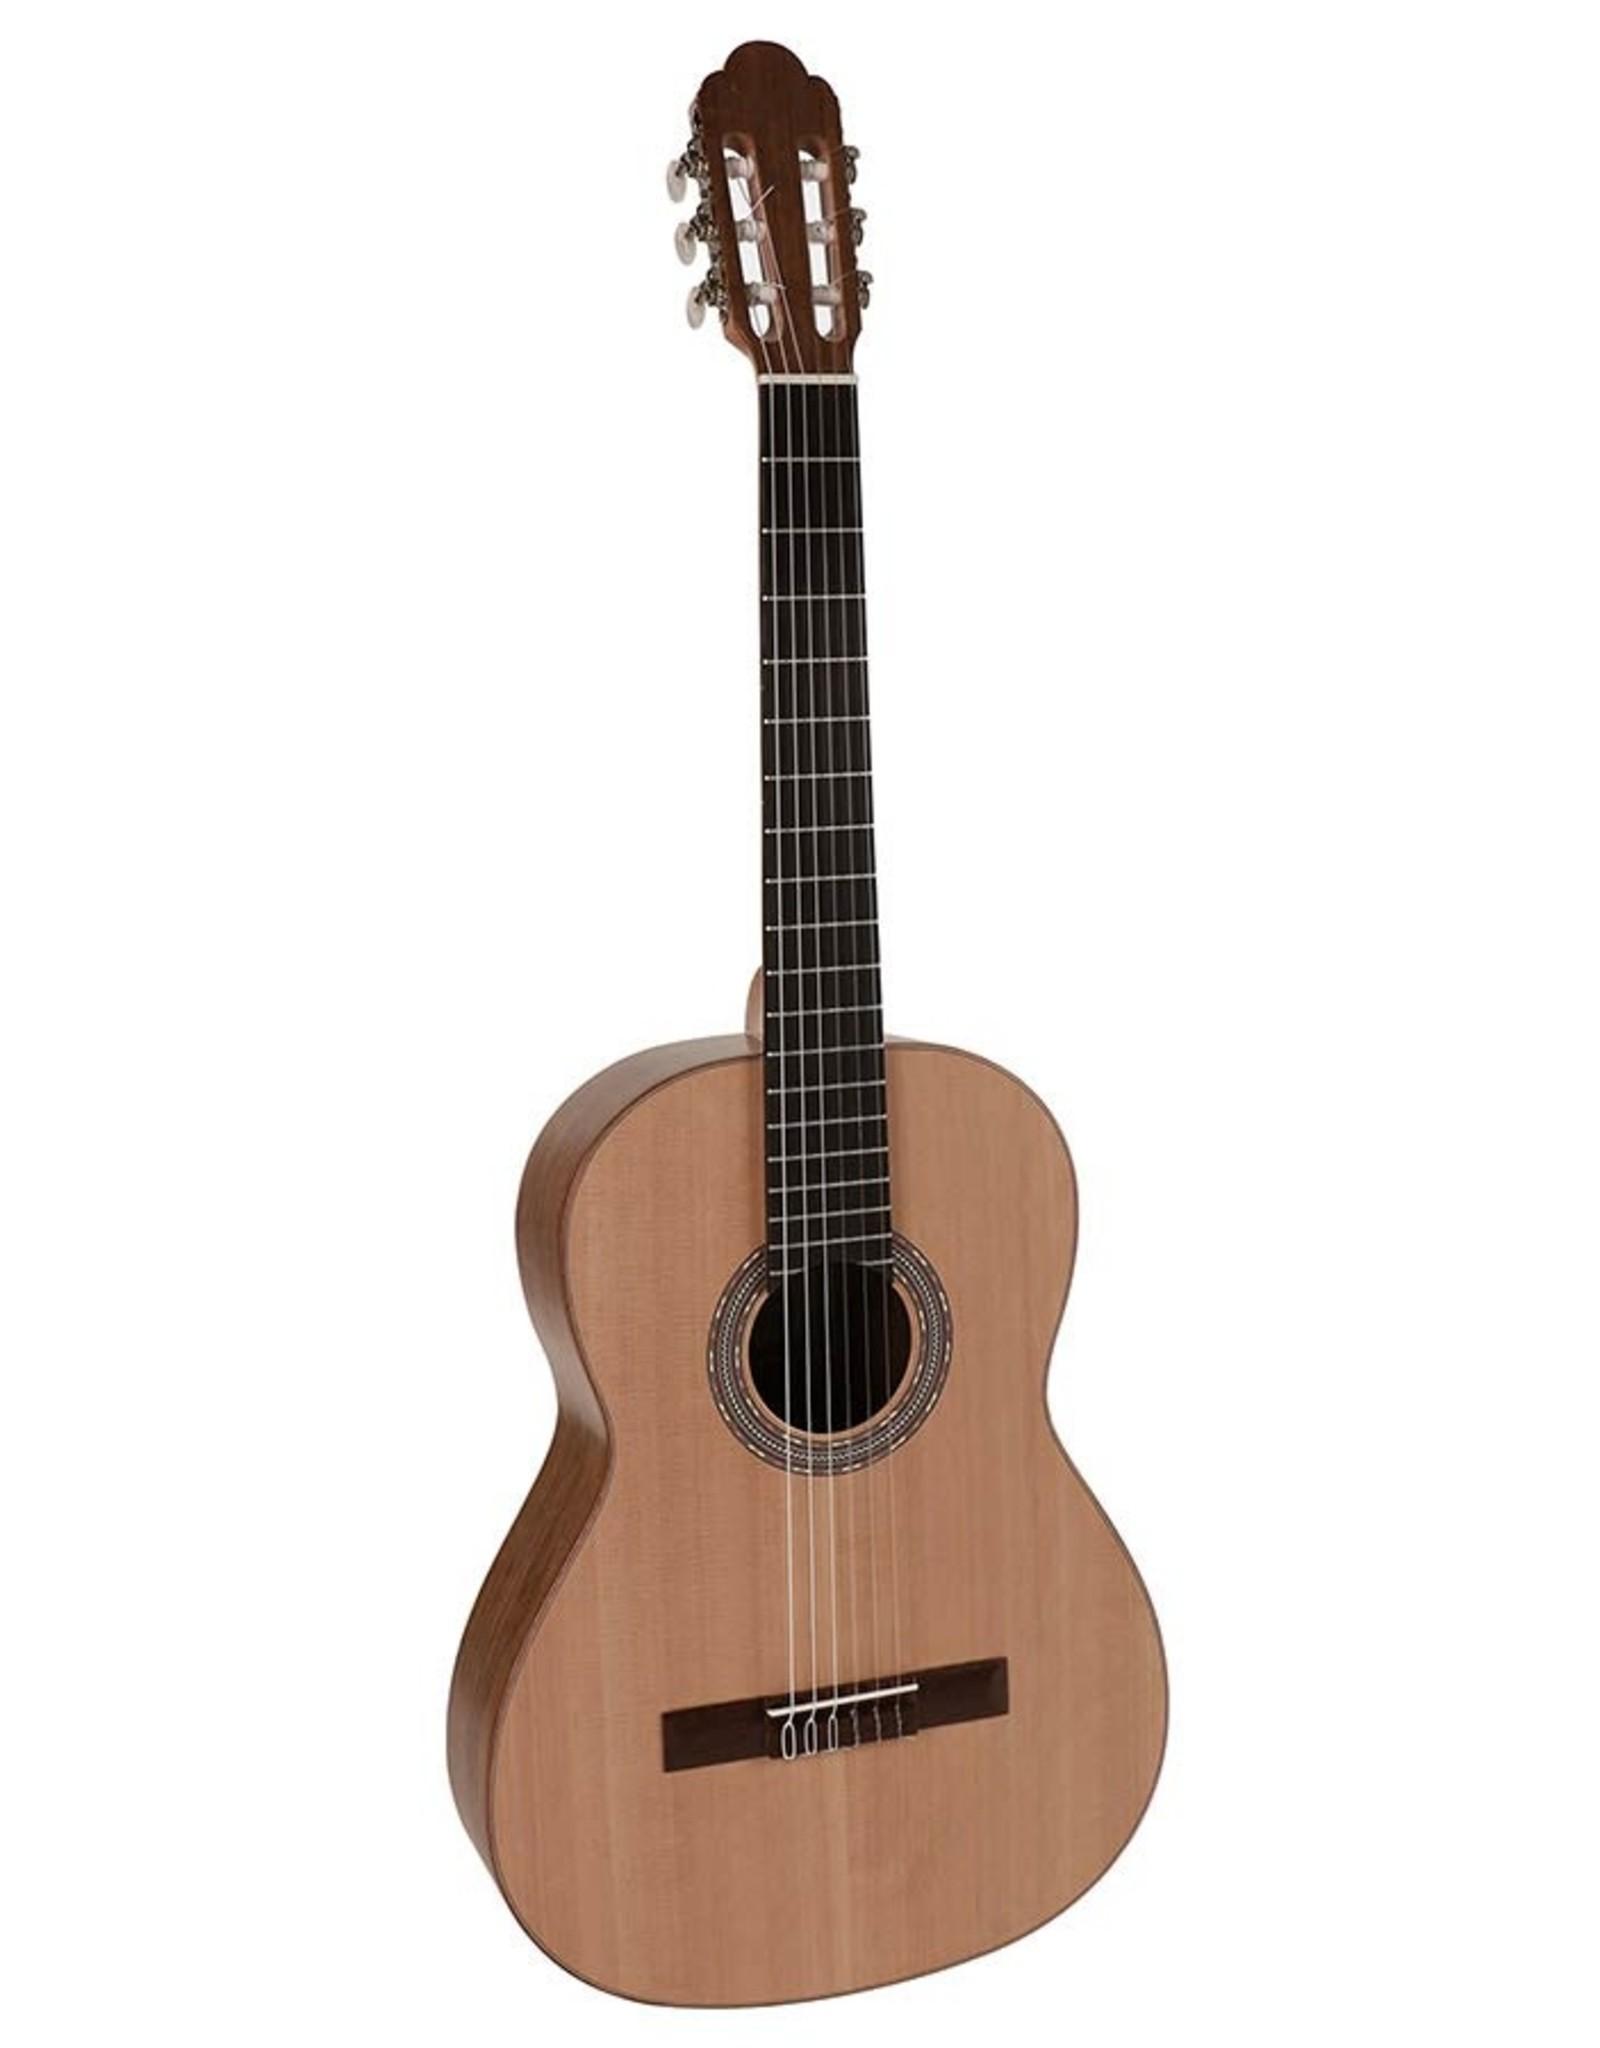 Esteve Esteve  Turia-CD Organic Series Organic Series klassieke gitaar